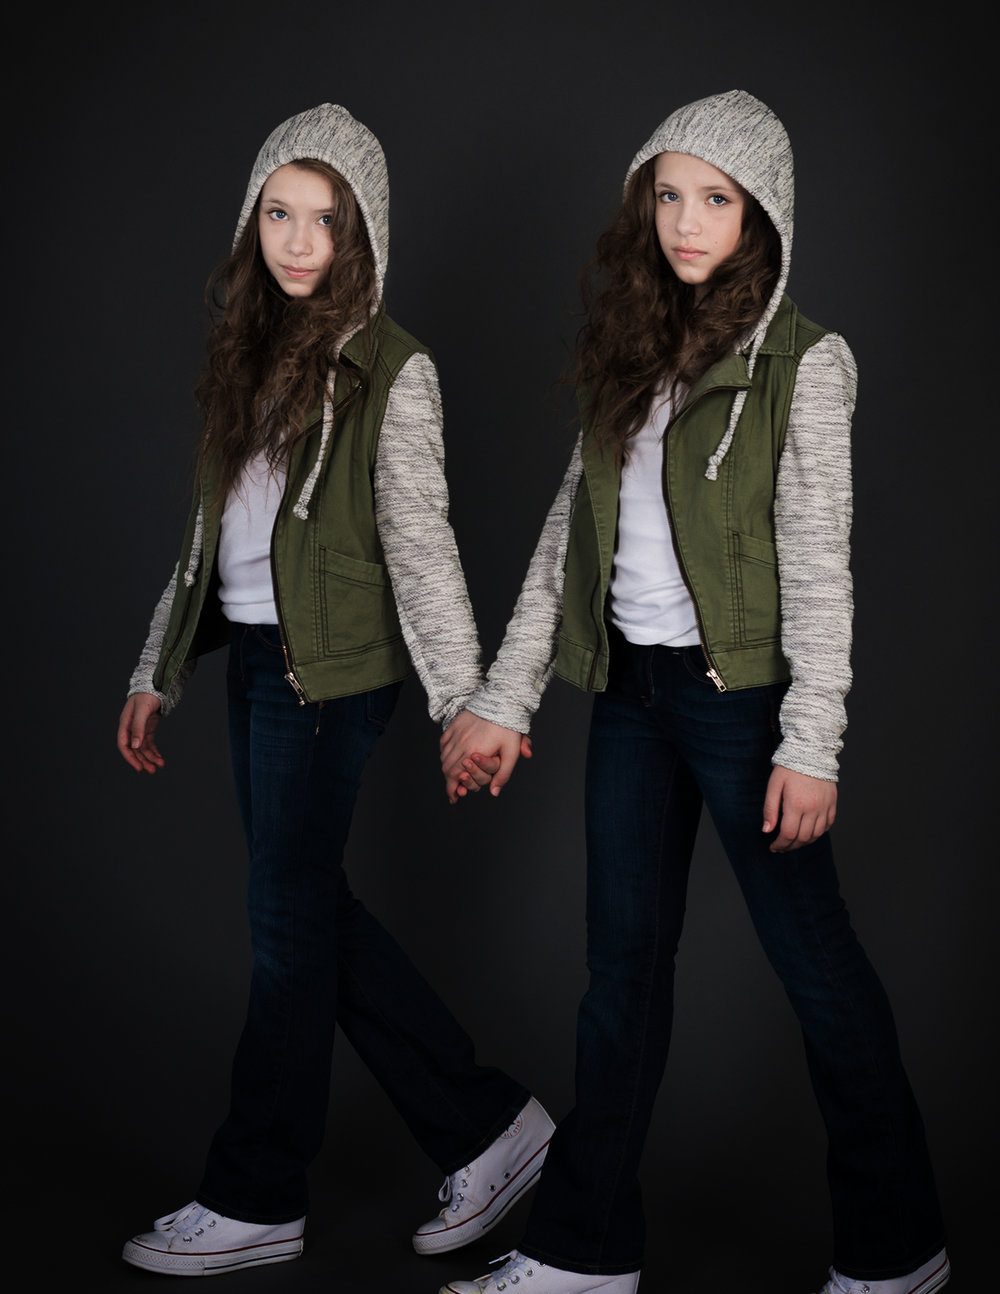 Bianca & Chiara D'Ambrosio